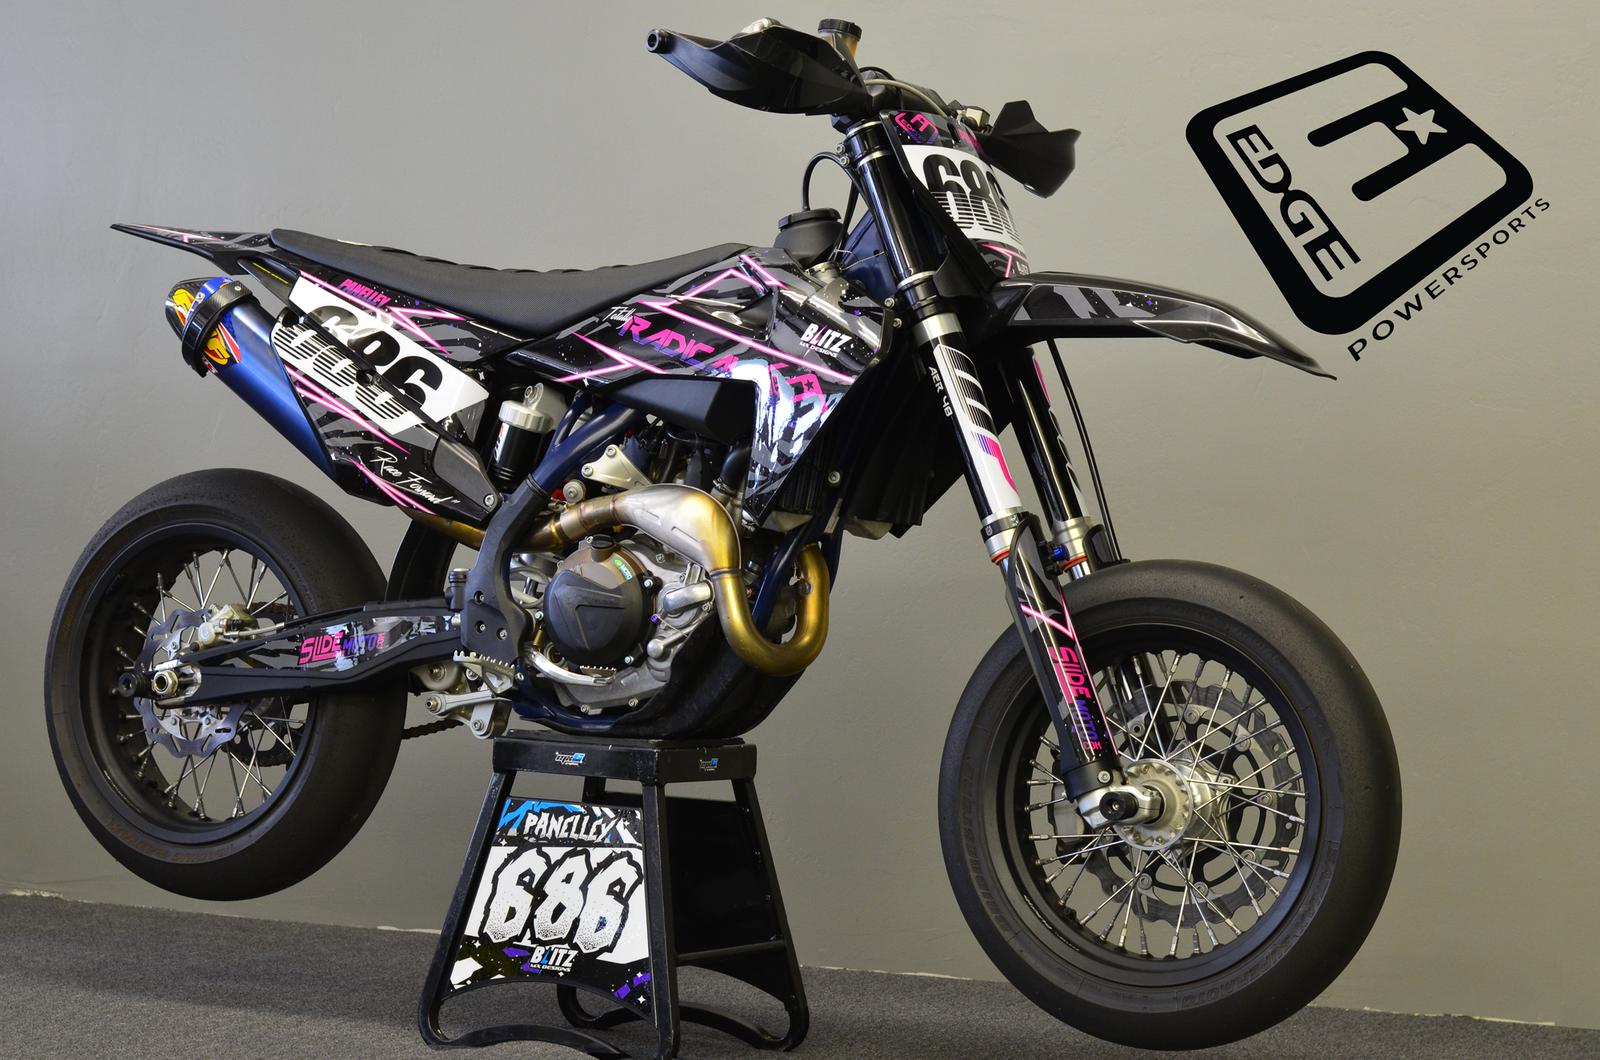 2019 Husqvarna Motorcycles FS 450 Supermoto